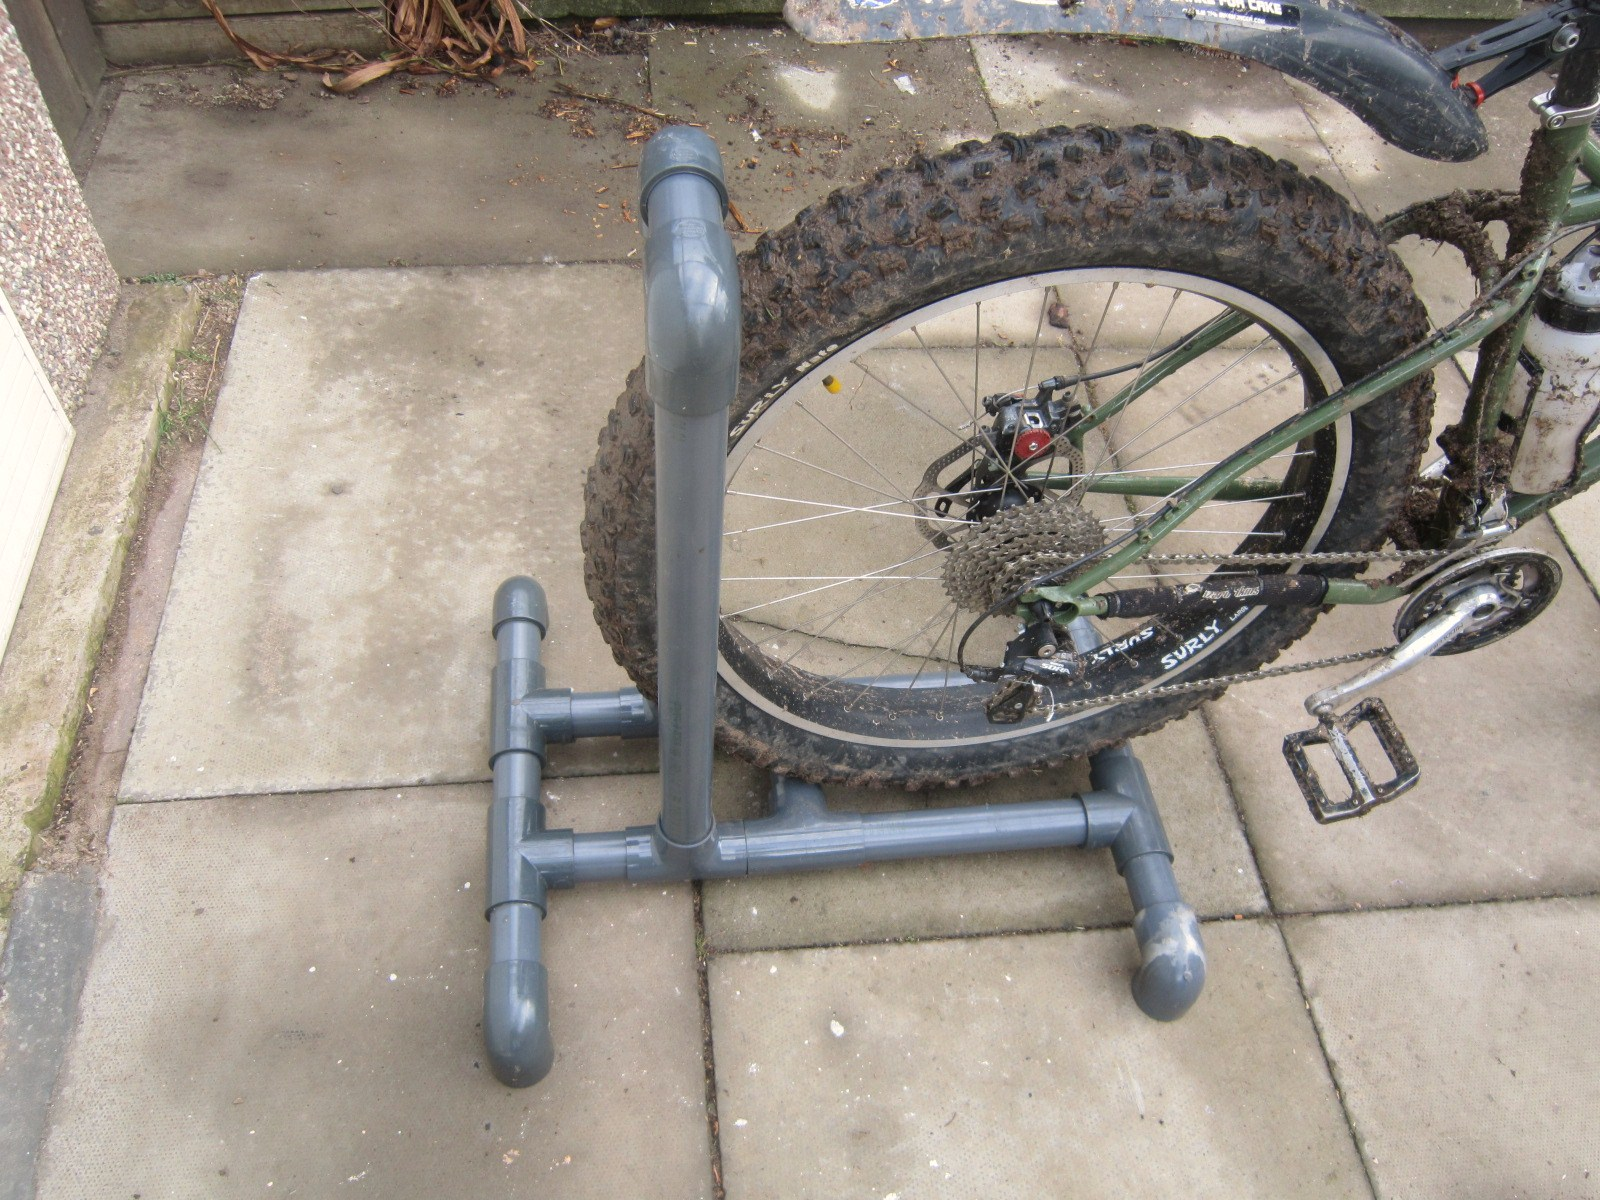 Coastrider Diy Fatbike Pvc Pipe Washstand